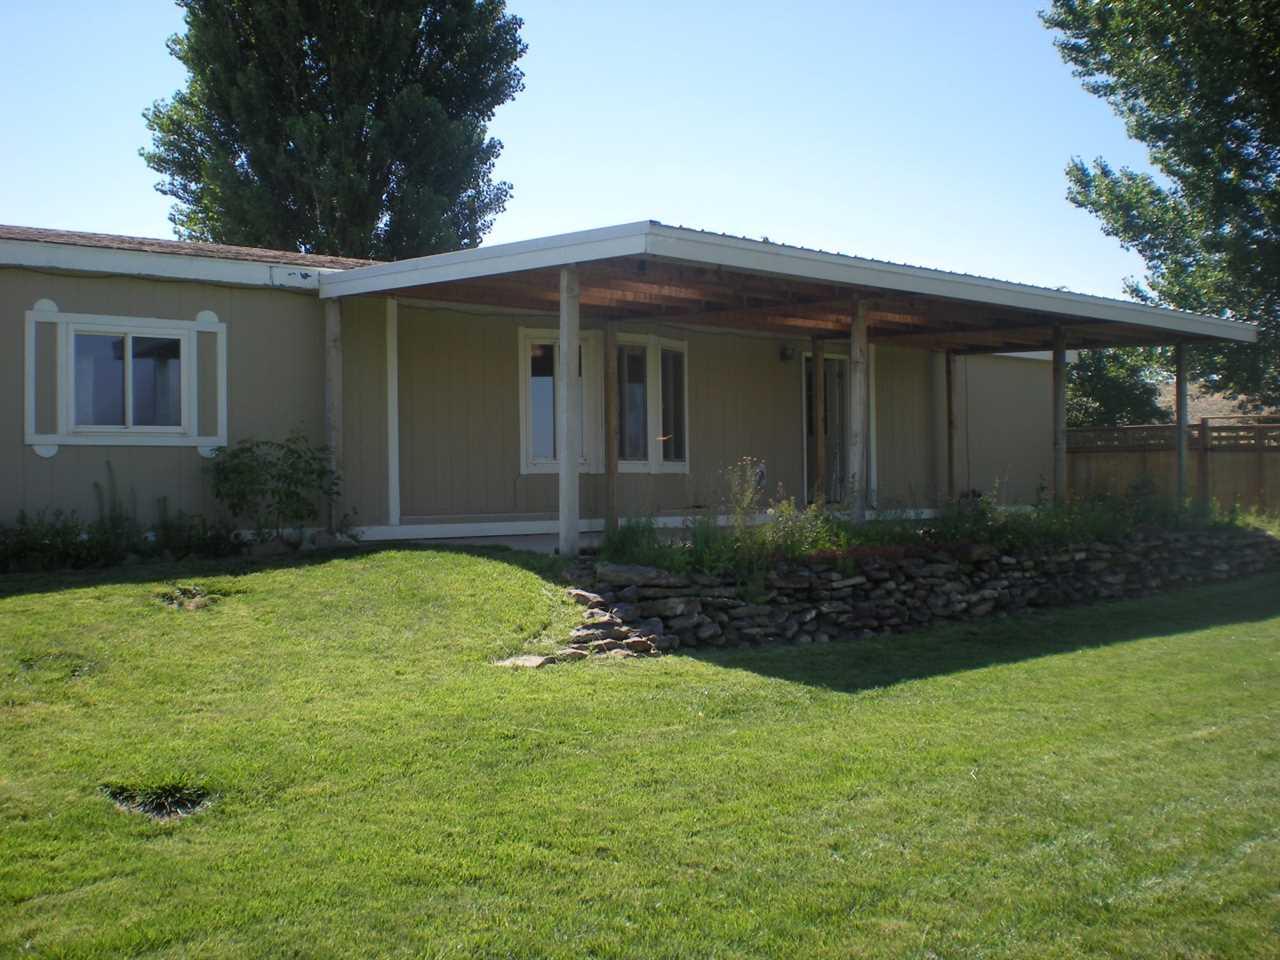 31695 State Highway 51, Bruneau, ID 83604